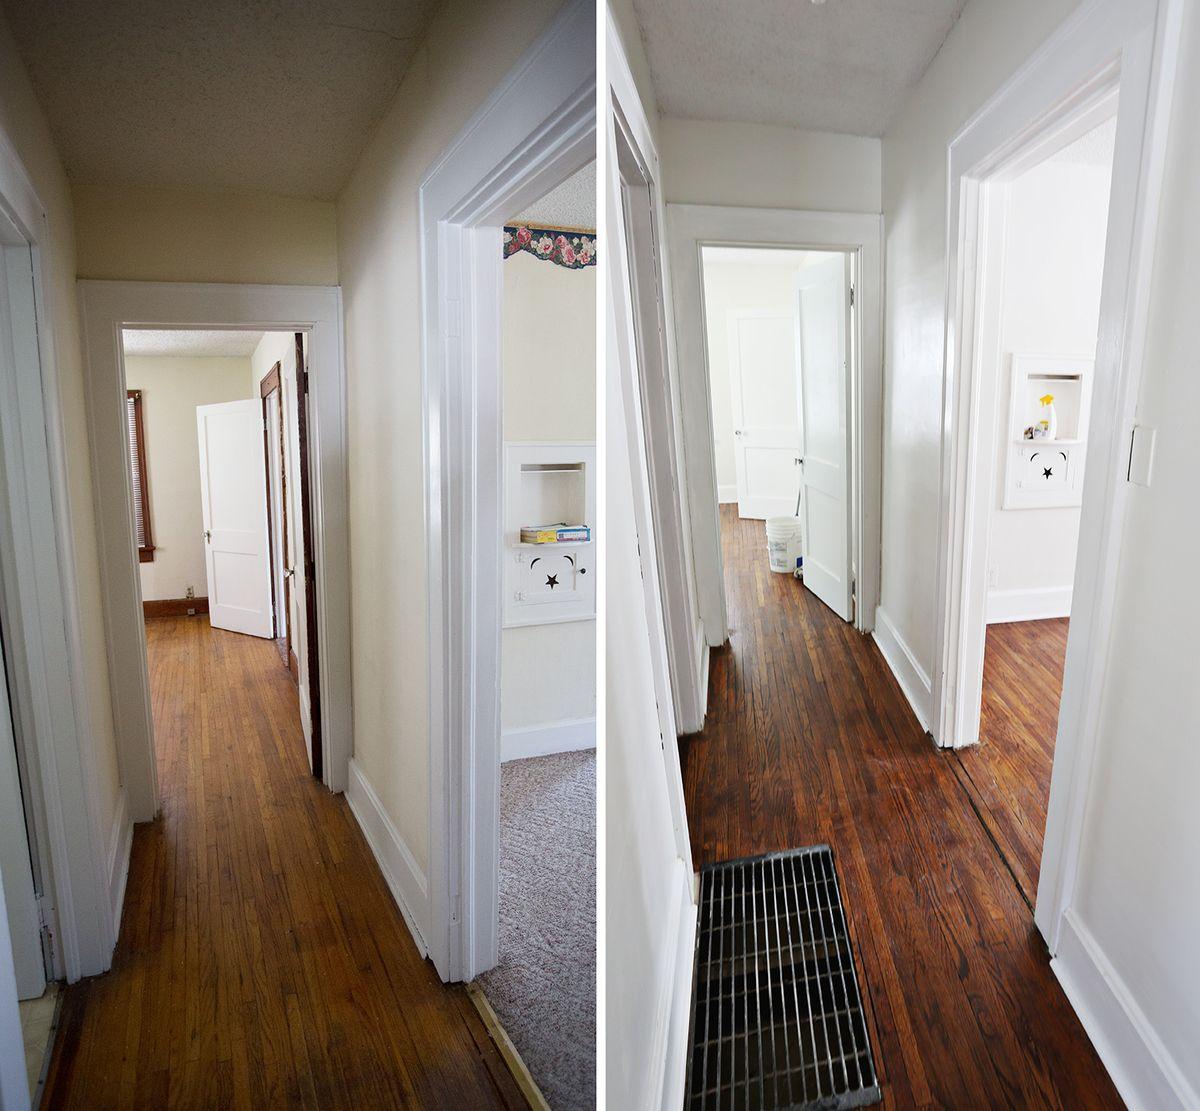 Refinishing Old Wood Floors  A Beautiful Mess